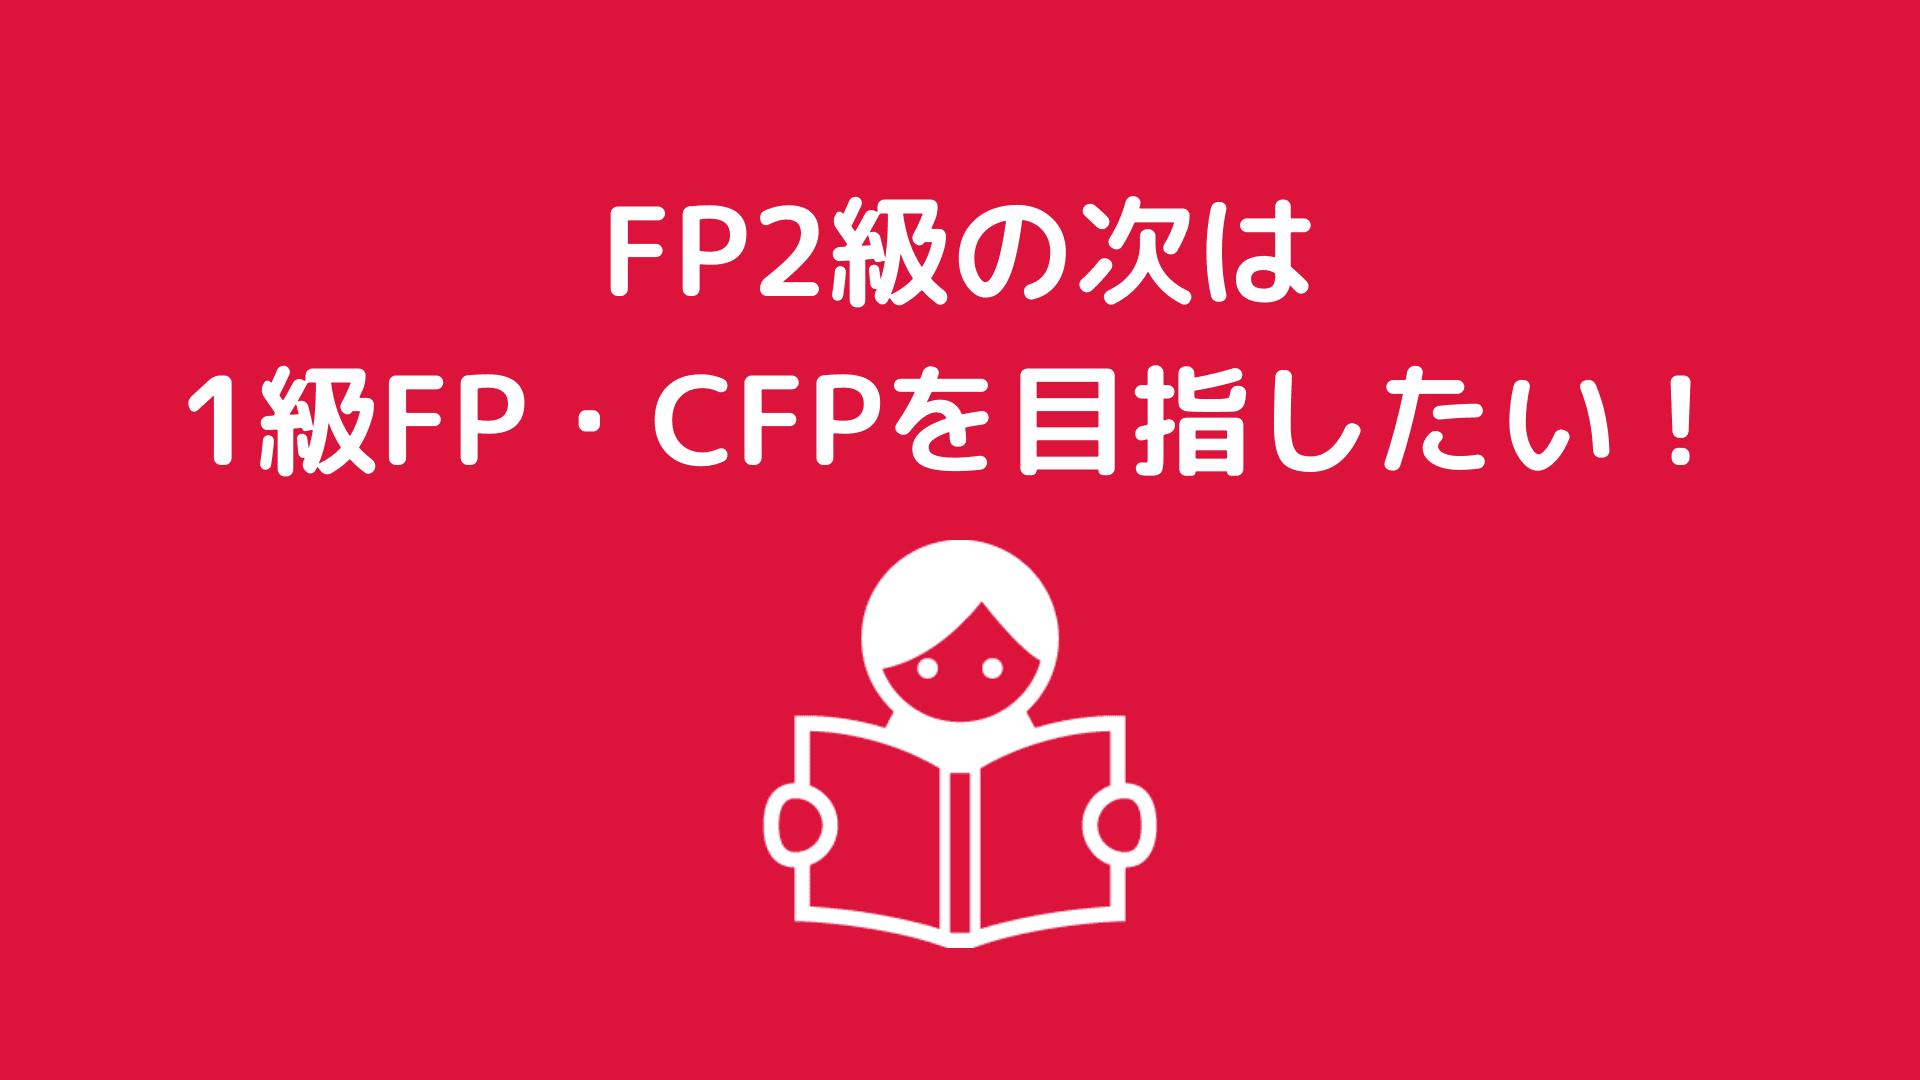 Next fp2